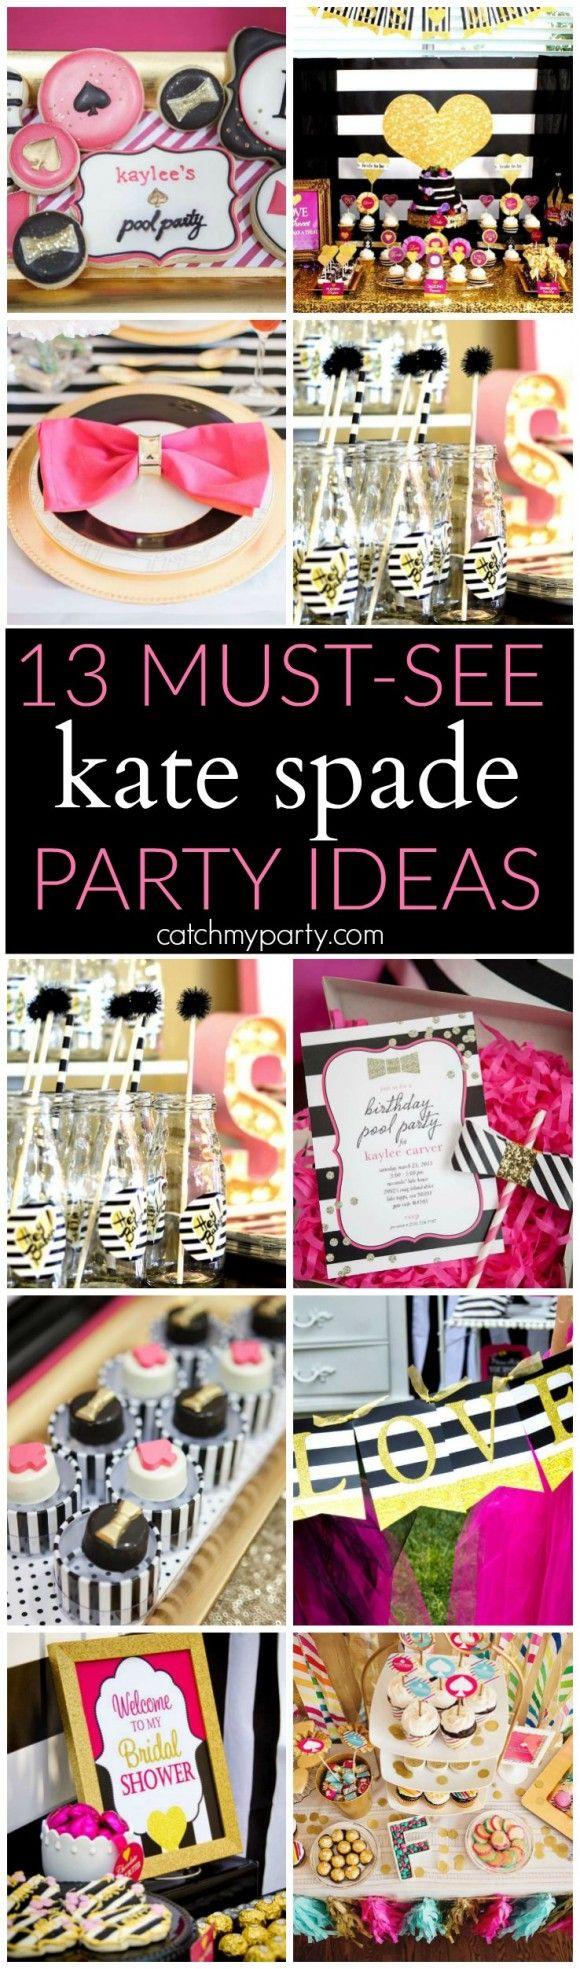 Kate Spade party ideas Catchmypartycom 13